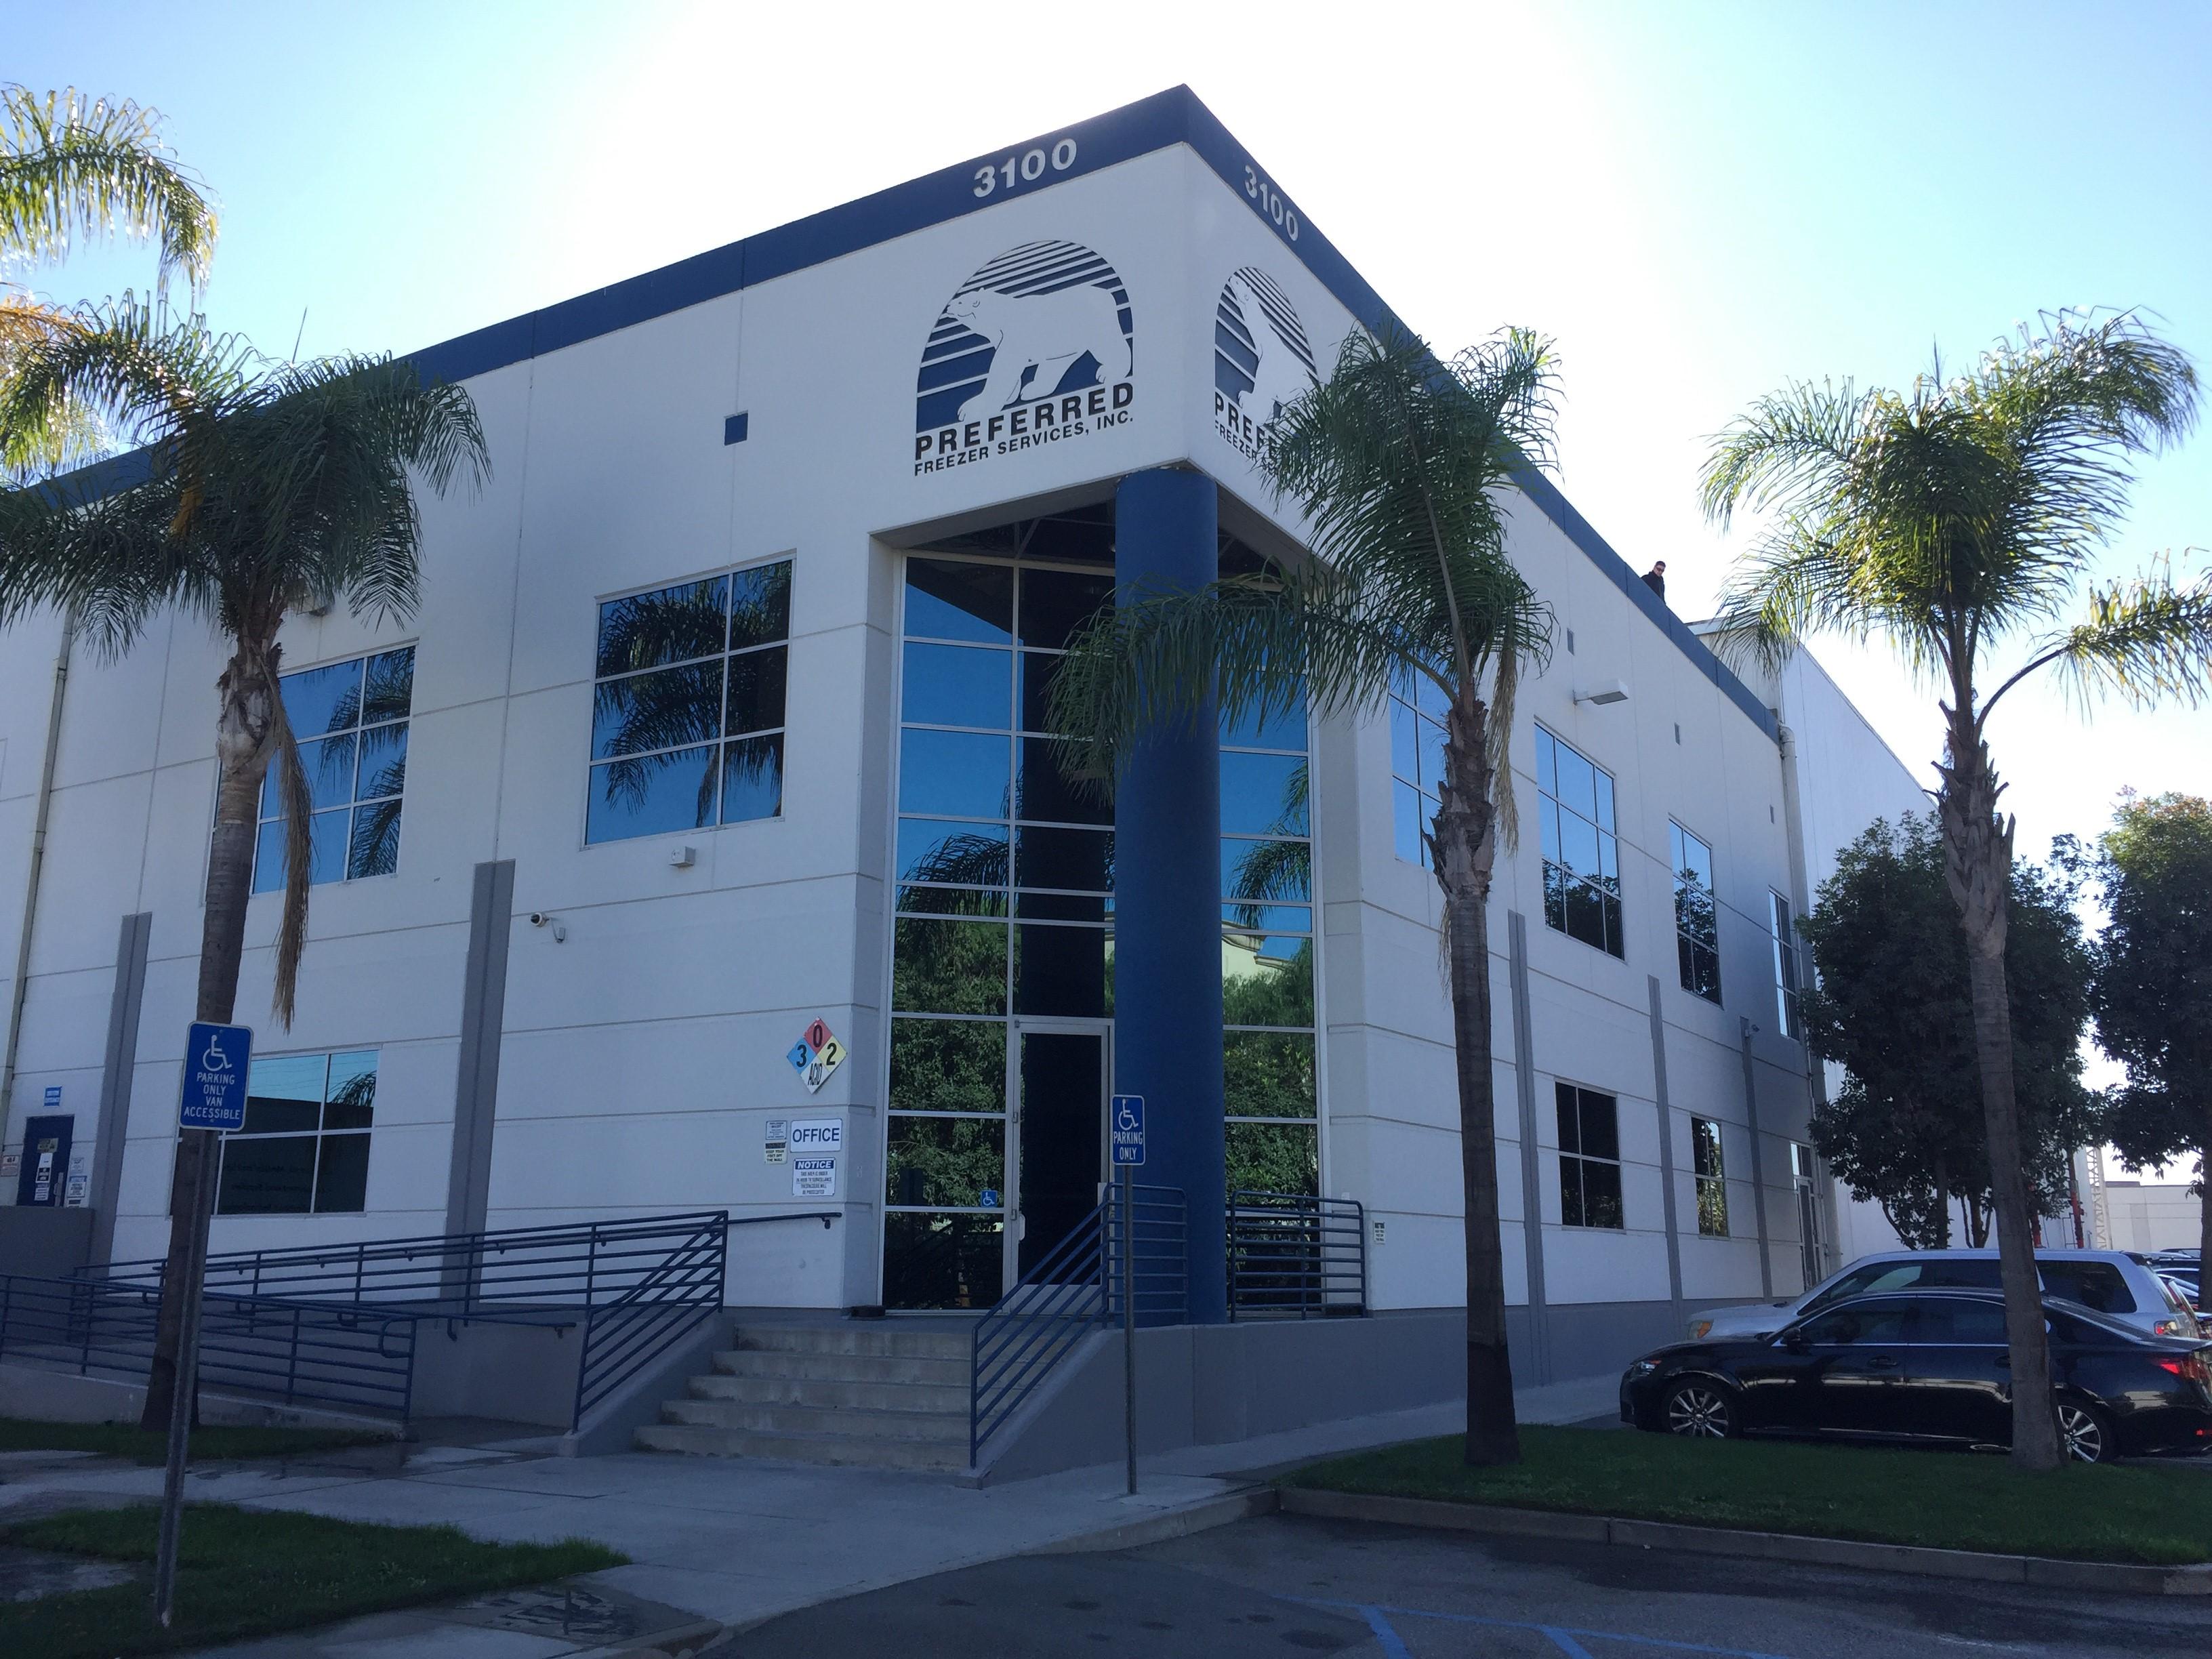 Los Angeles CA - Cold Storage & Sunrise Mortgage | Los Angeles CA - Cold Storage